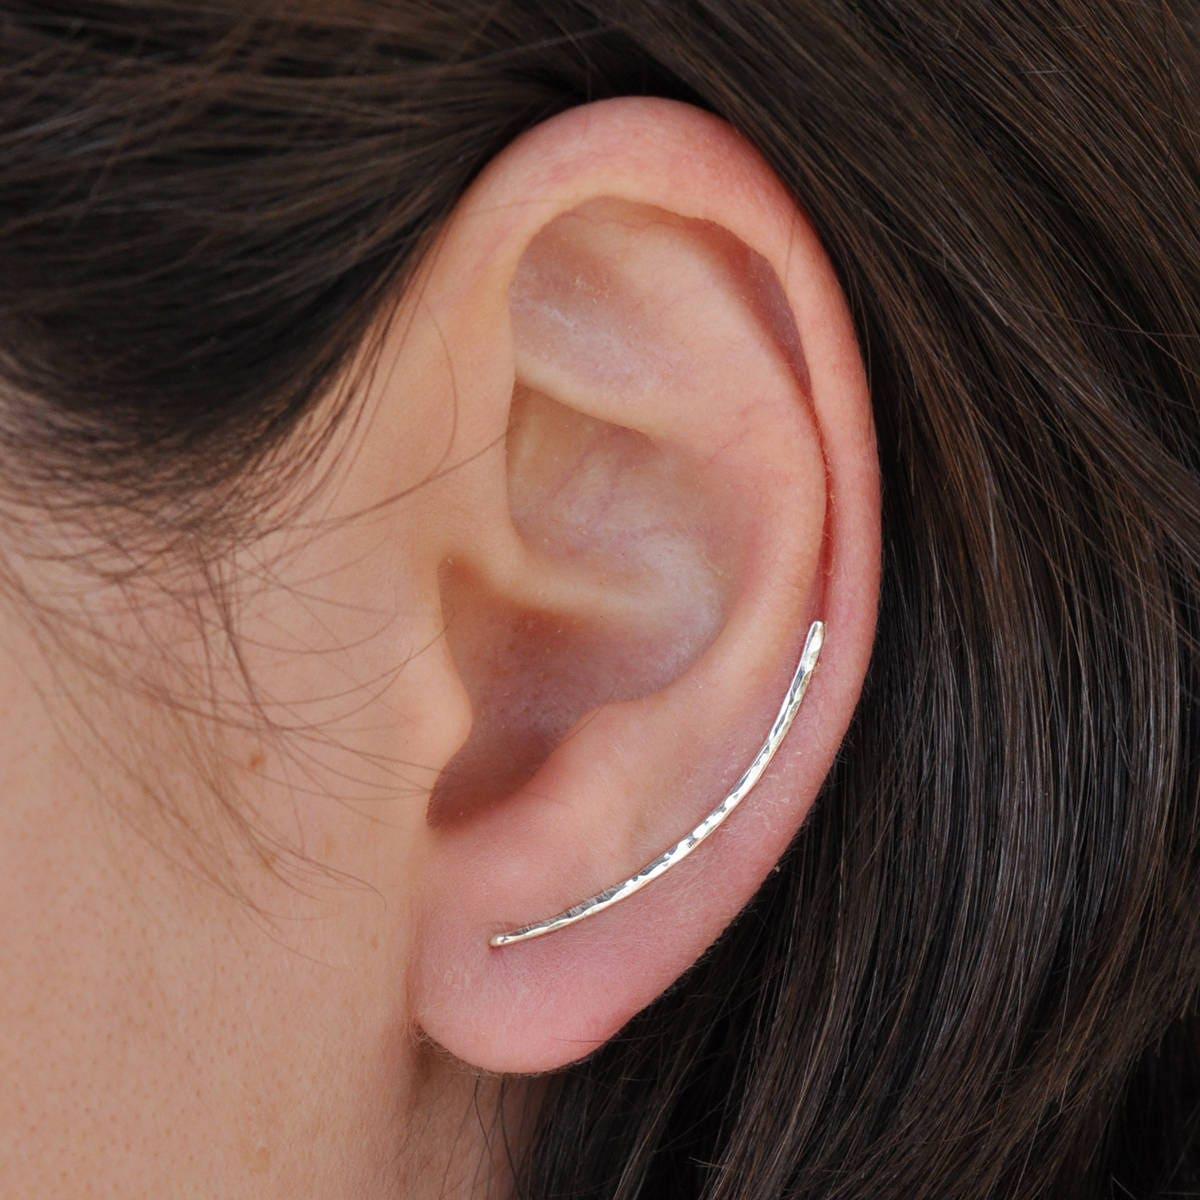 Geschwungene Bar Pin Ohrringe Sterling Silber Ohr Manschette